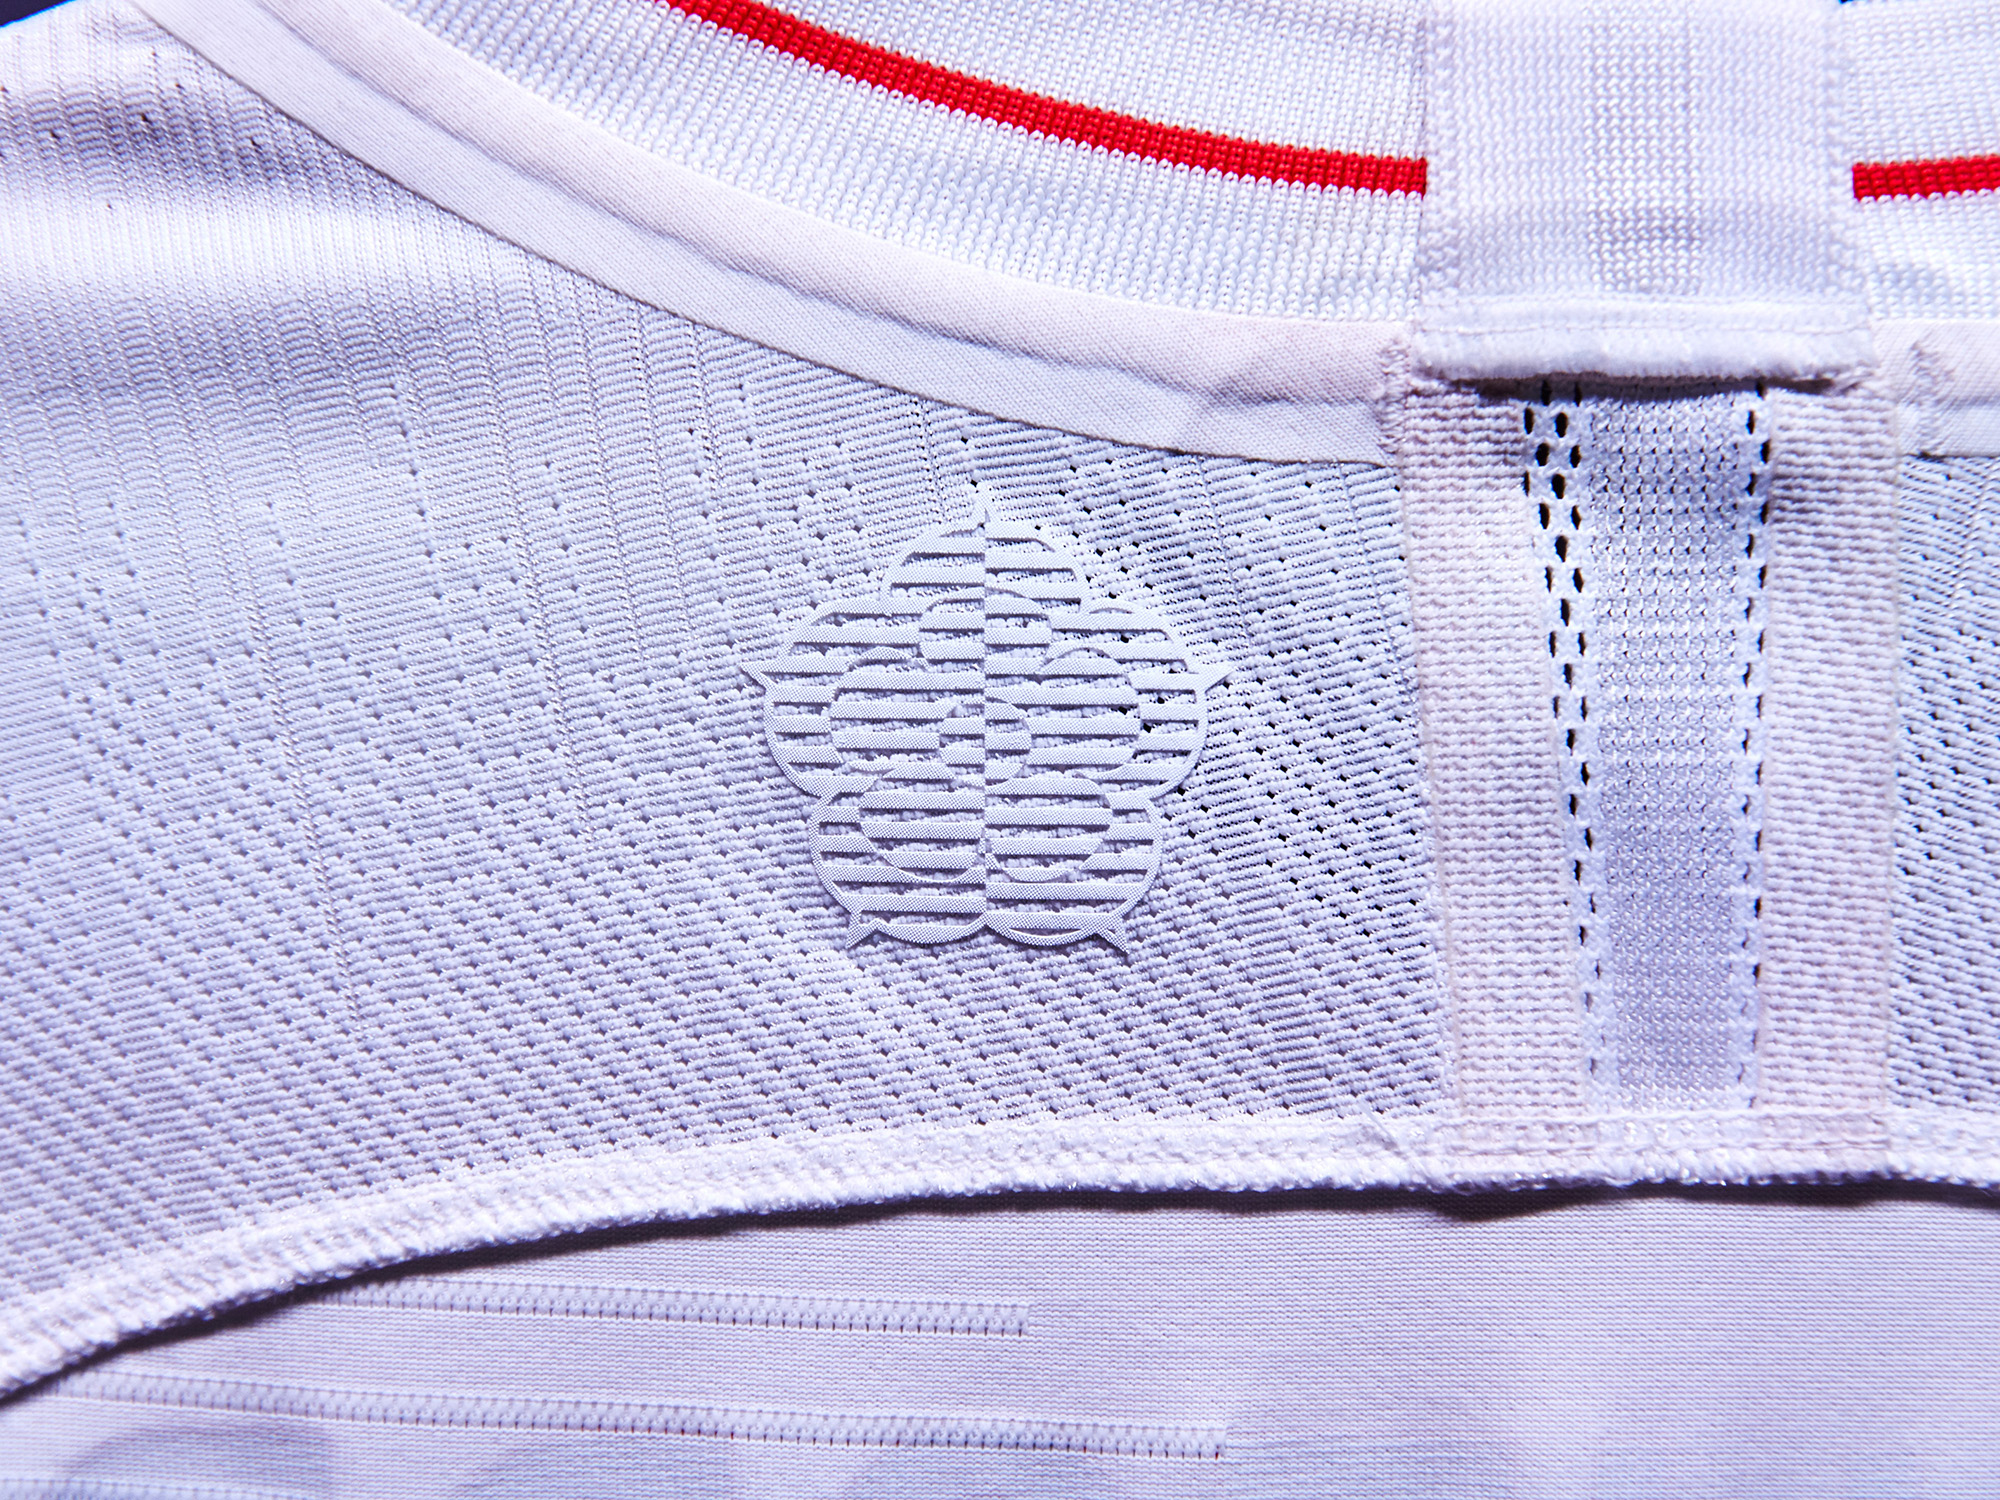 Nike-News-Football-Soccer-England-National-Team-Kit-6_77381